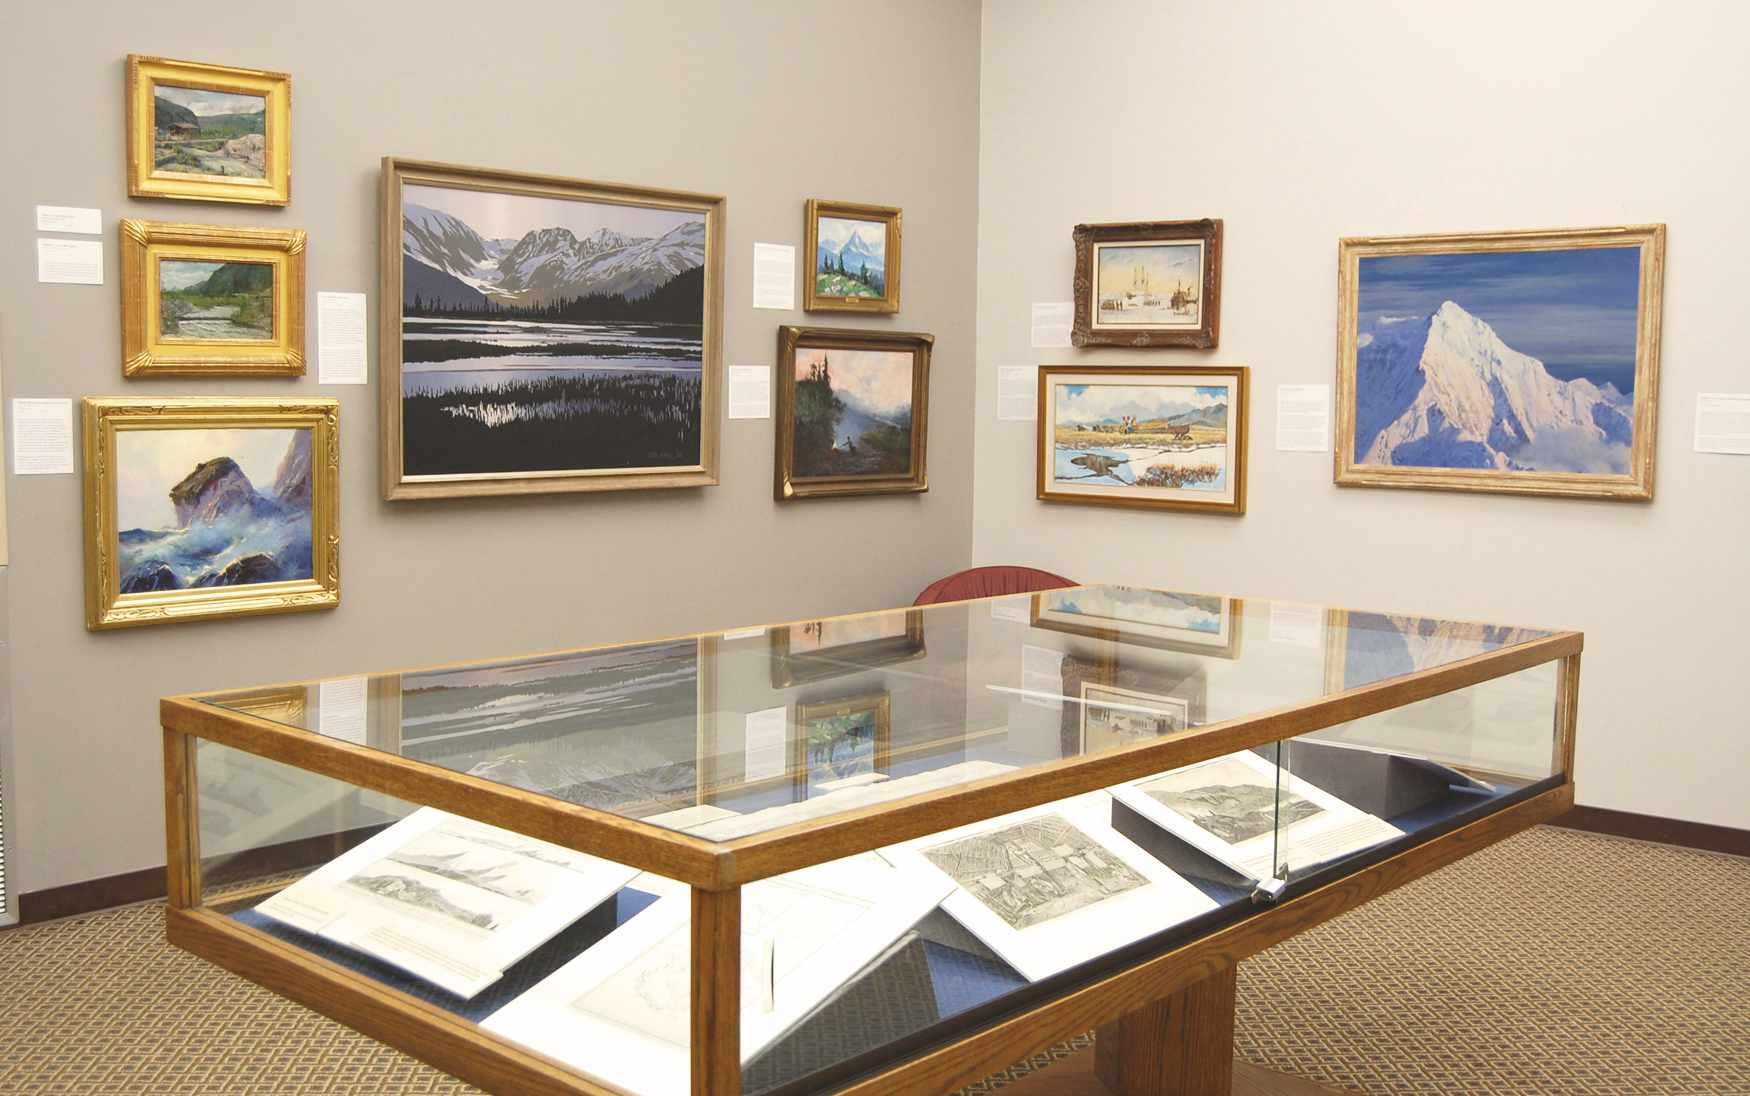 Alaskan artifacts